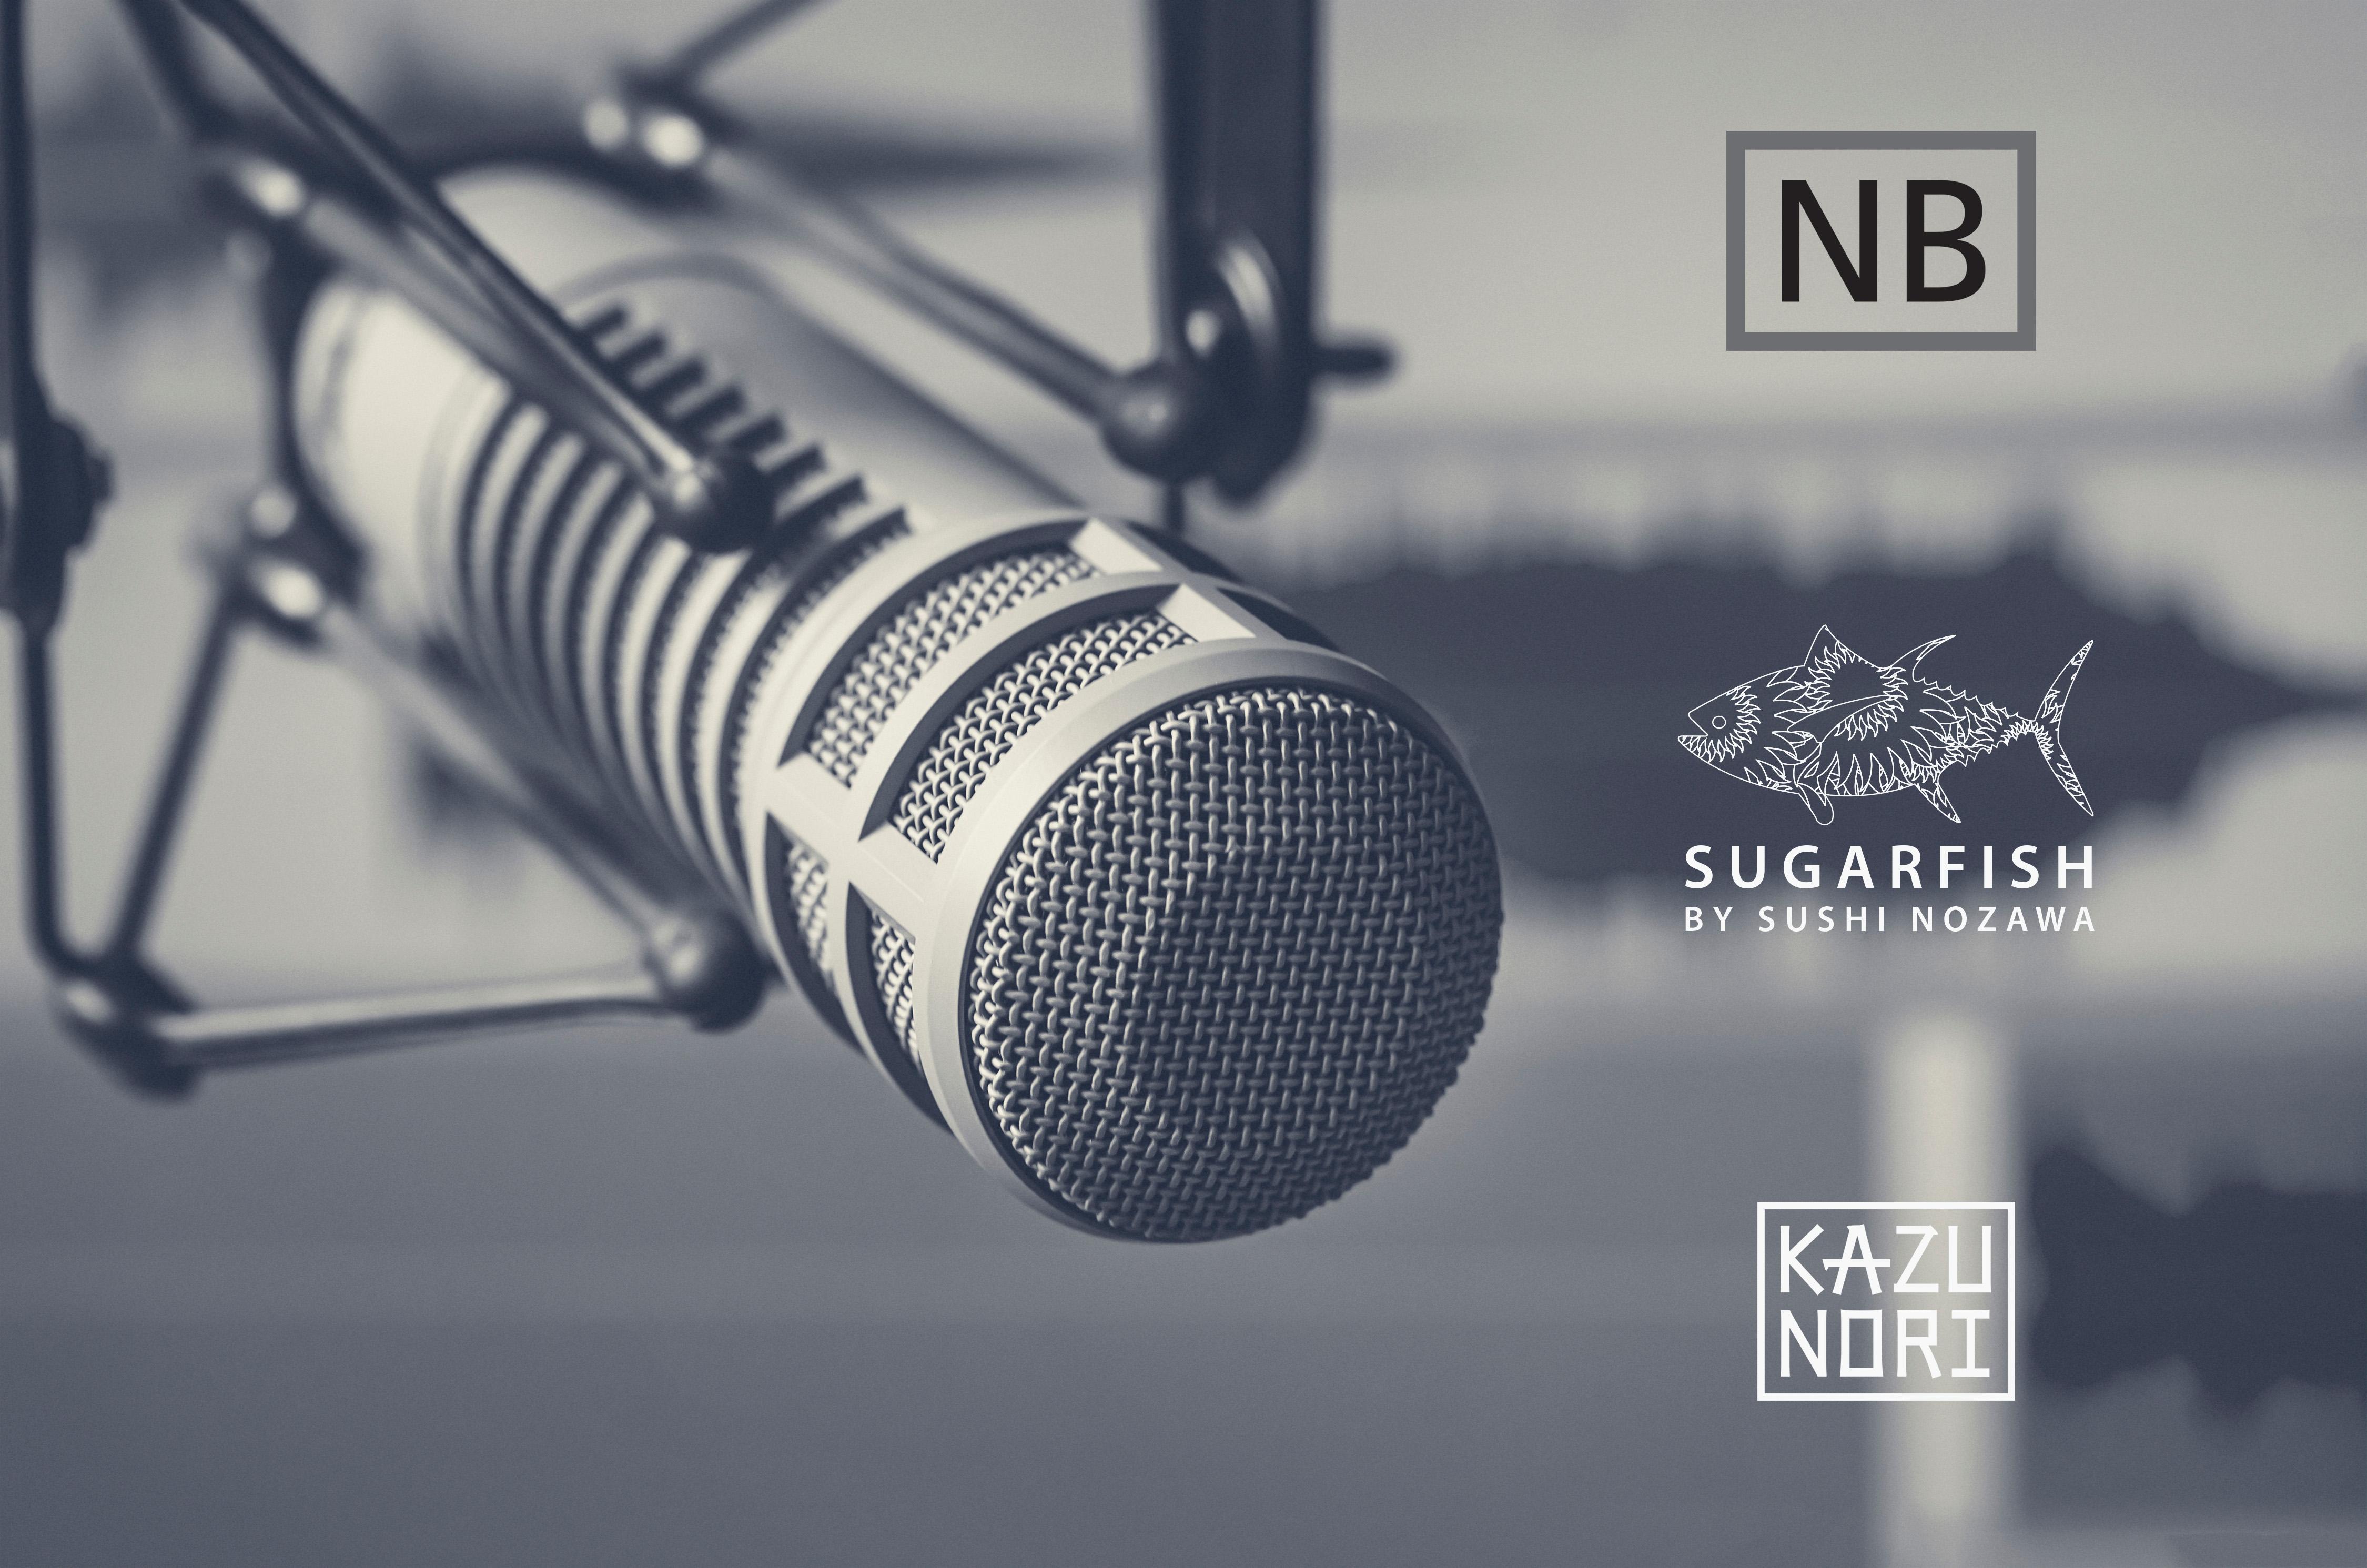 Microphone image with Nozawa Bar, SUGARFISH, and KazuNori logos